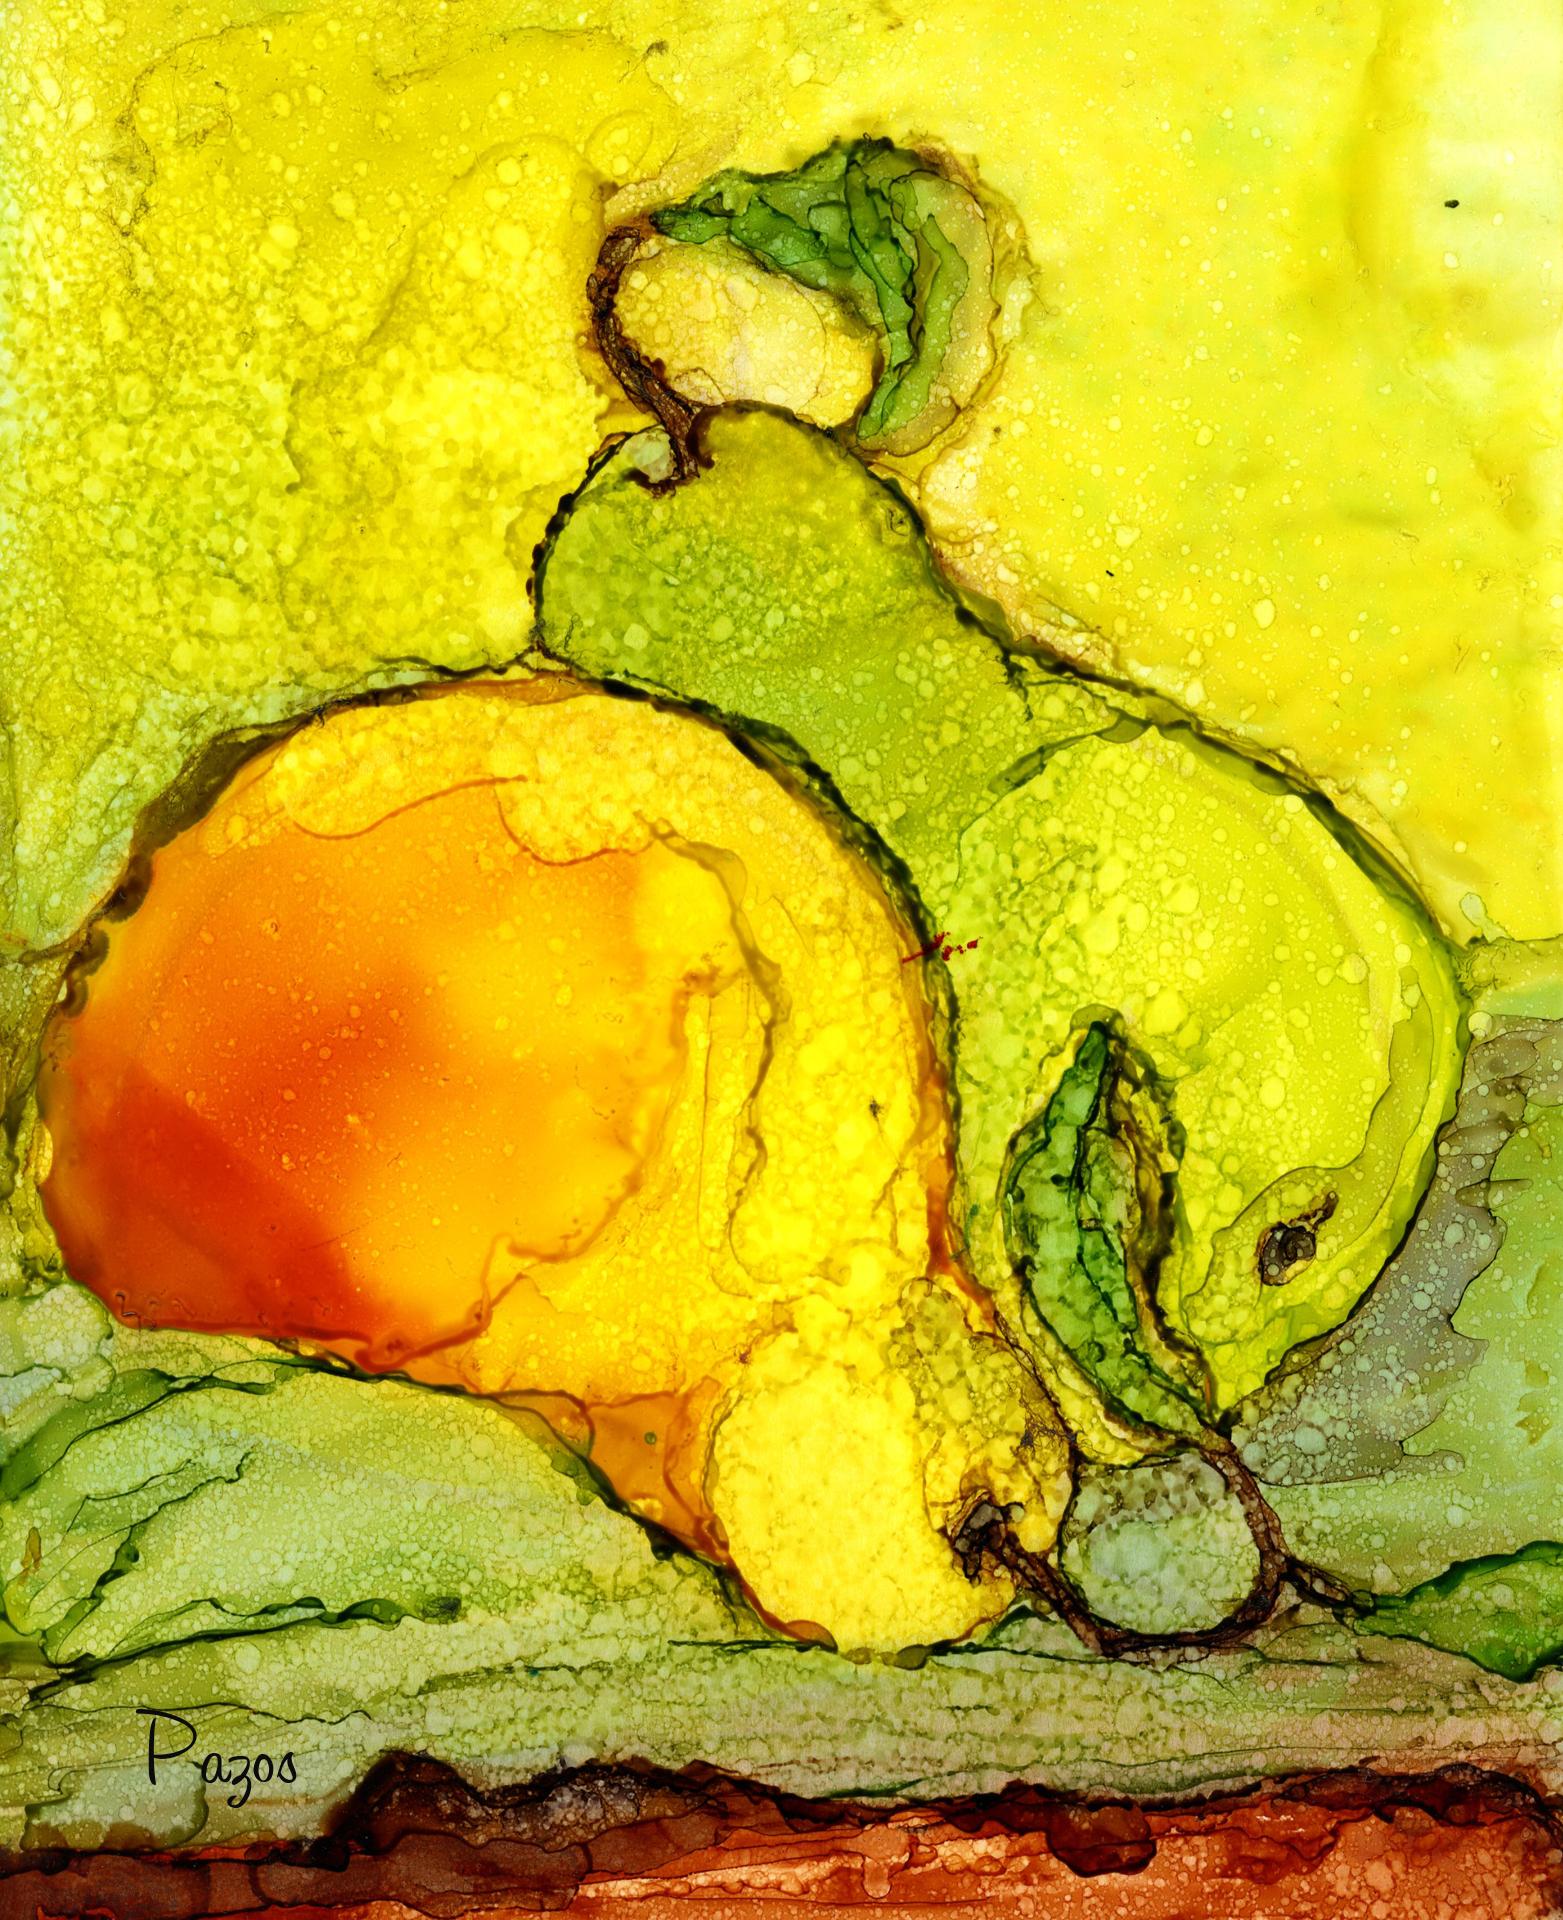 Dual Pears